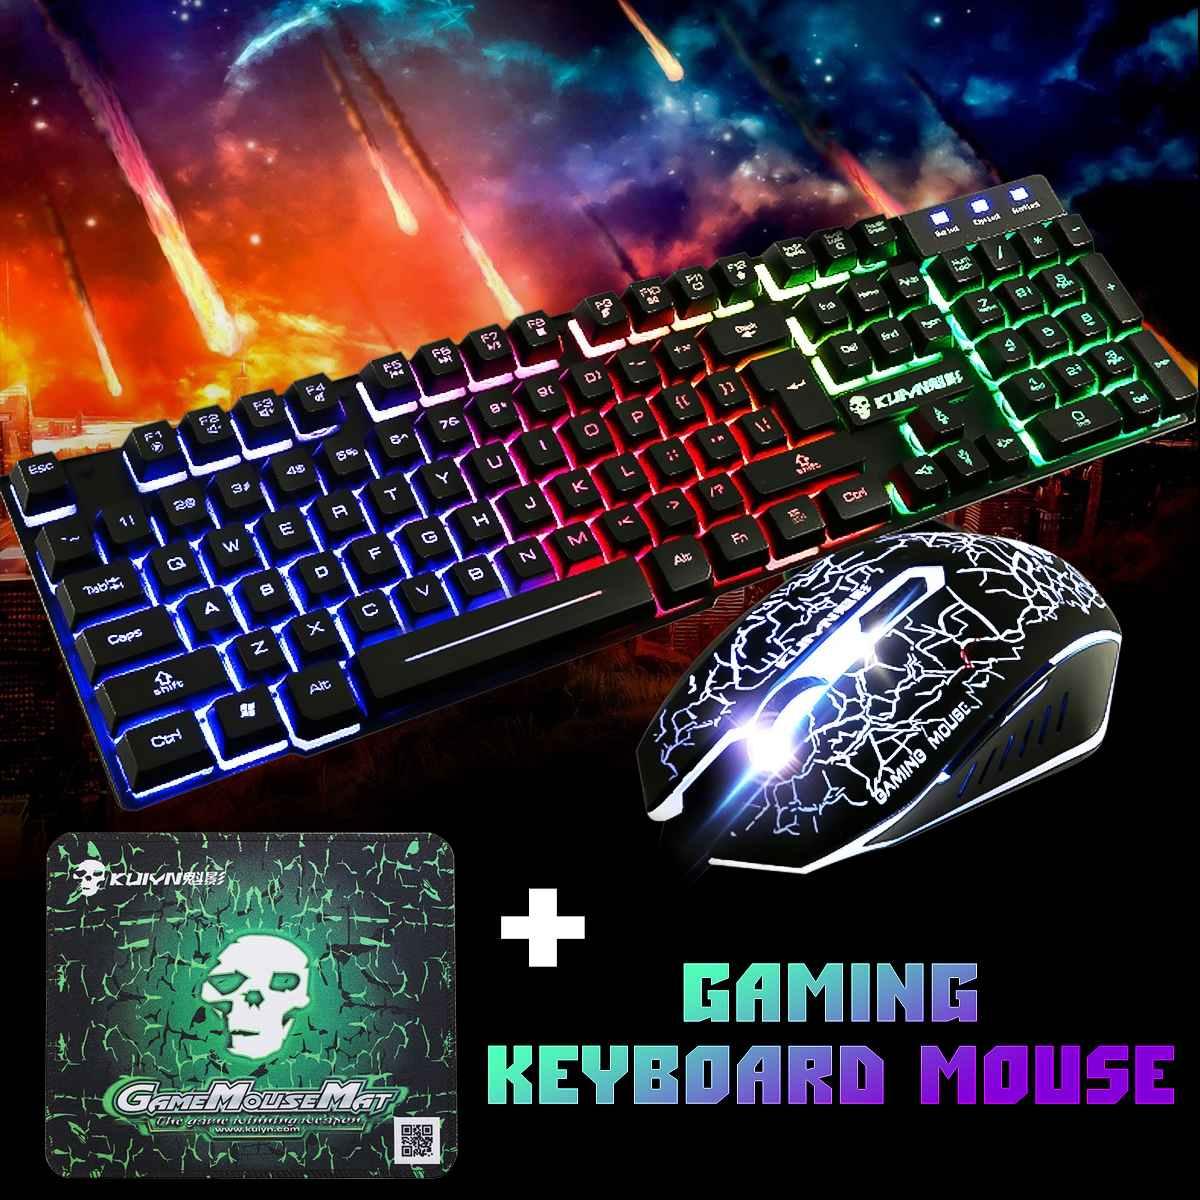 Teclado ergonómico de juegos por cable USB con retroiluminación LED de arco iris + Ratón de 2400DPI + juego de alfombrillas de ratón para PC ordenador portátil Gamer